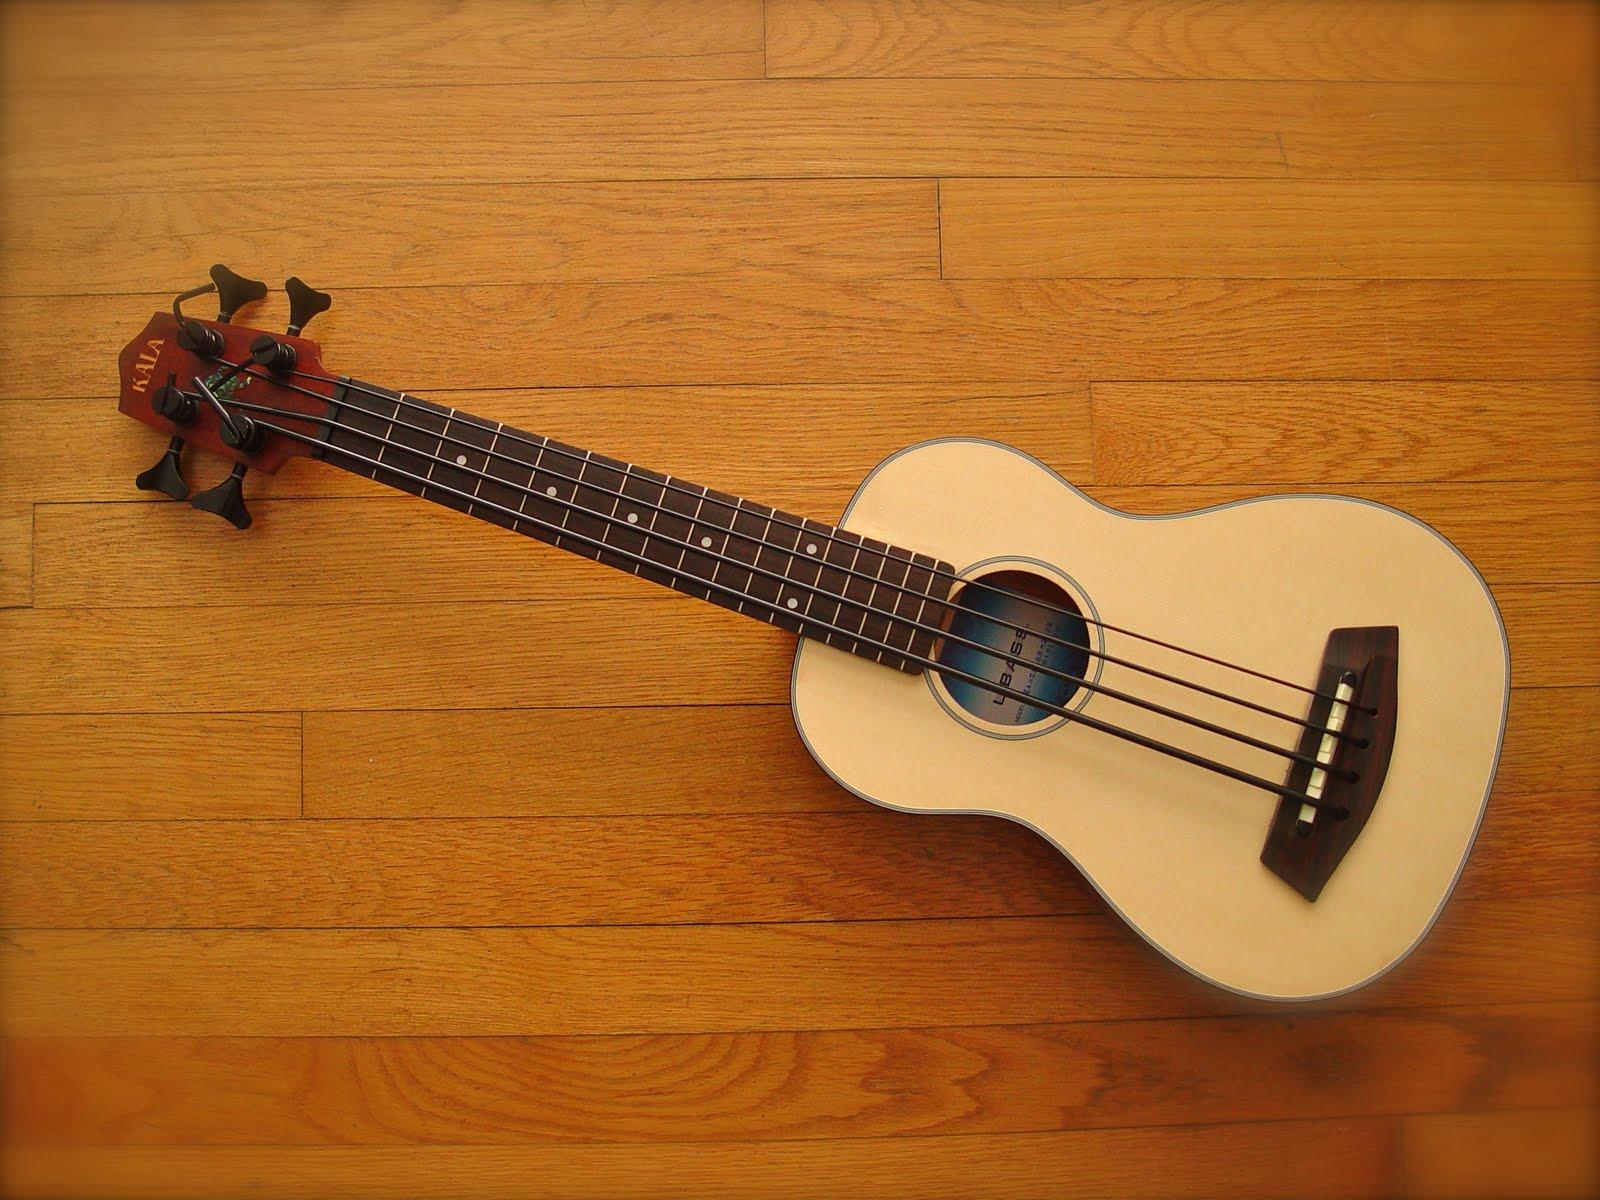 billyradd music my new kala u bass. Black Bedroom Furniture Sets. Home Design Ideas